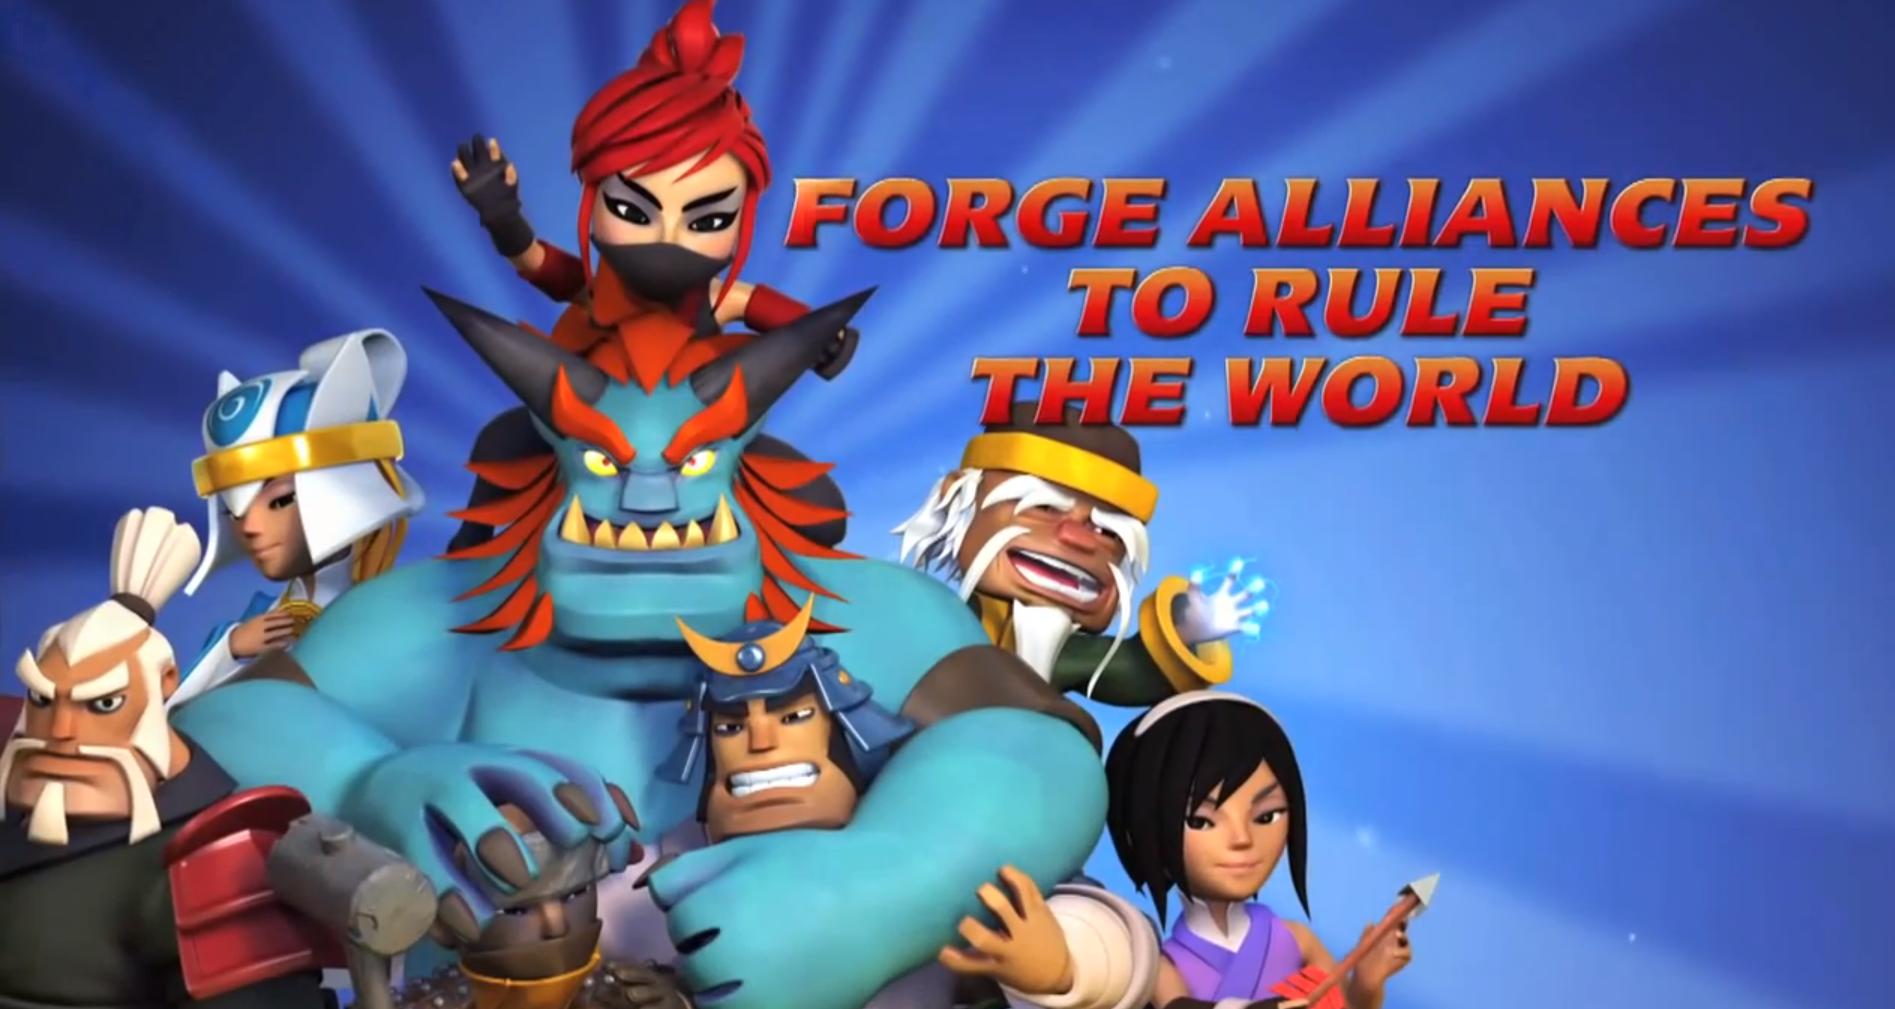 Samurai Siege: Forge Alliances to Rule The World